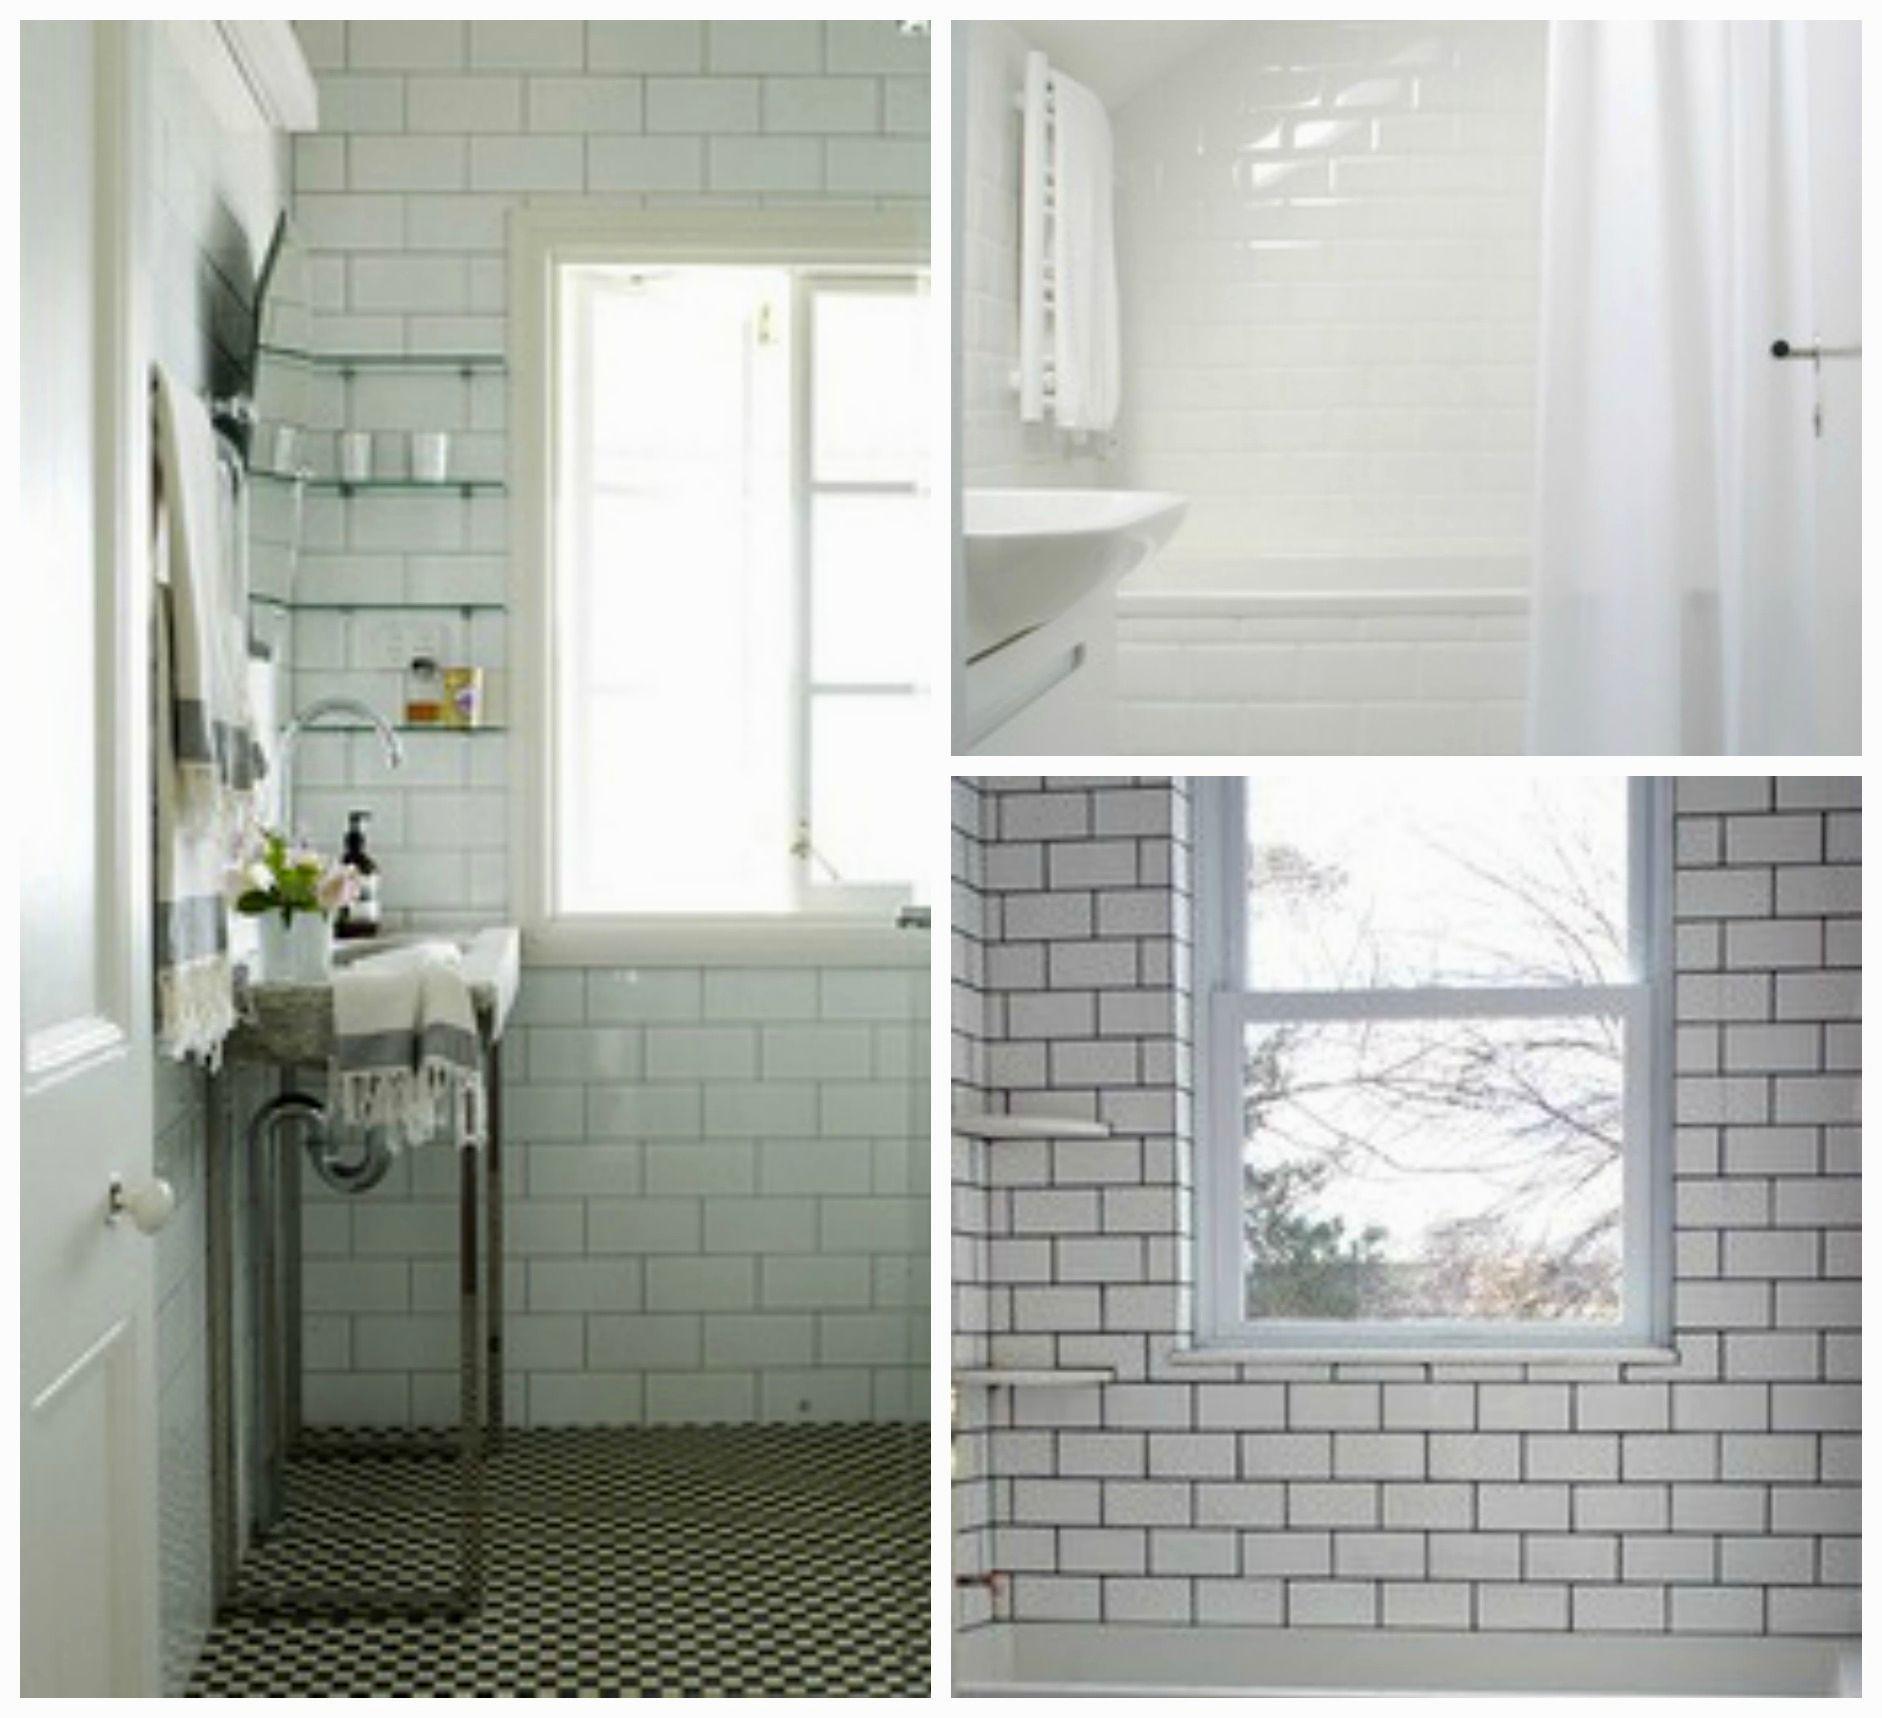 terrific images of bathroom remodels construction-Cool Images Of Bathroom Remodels Design